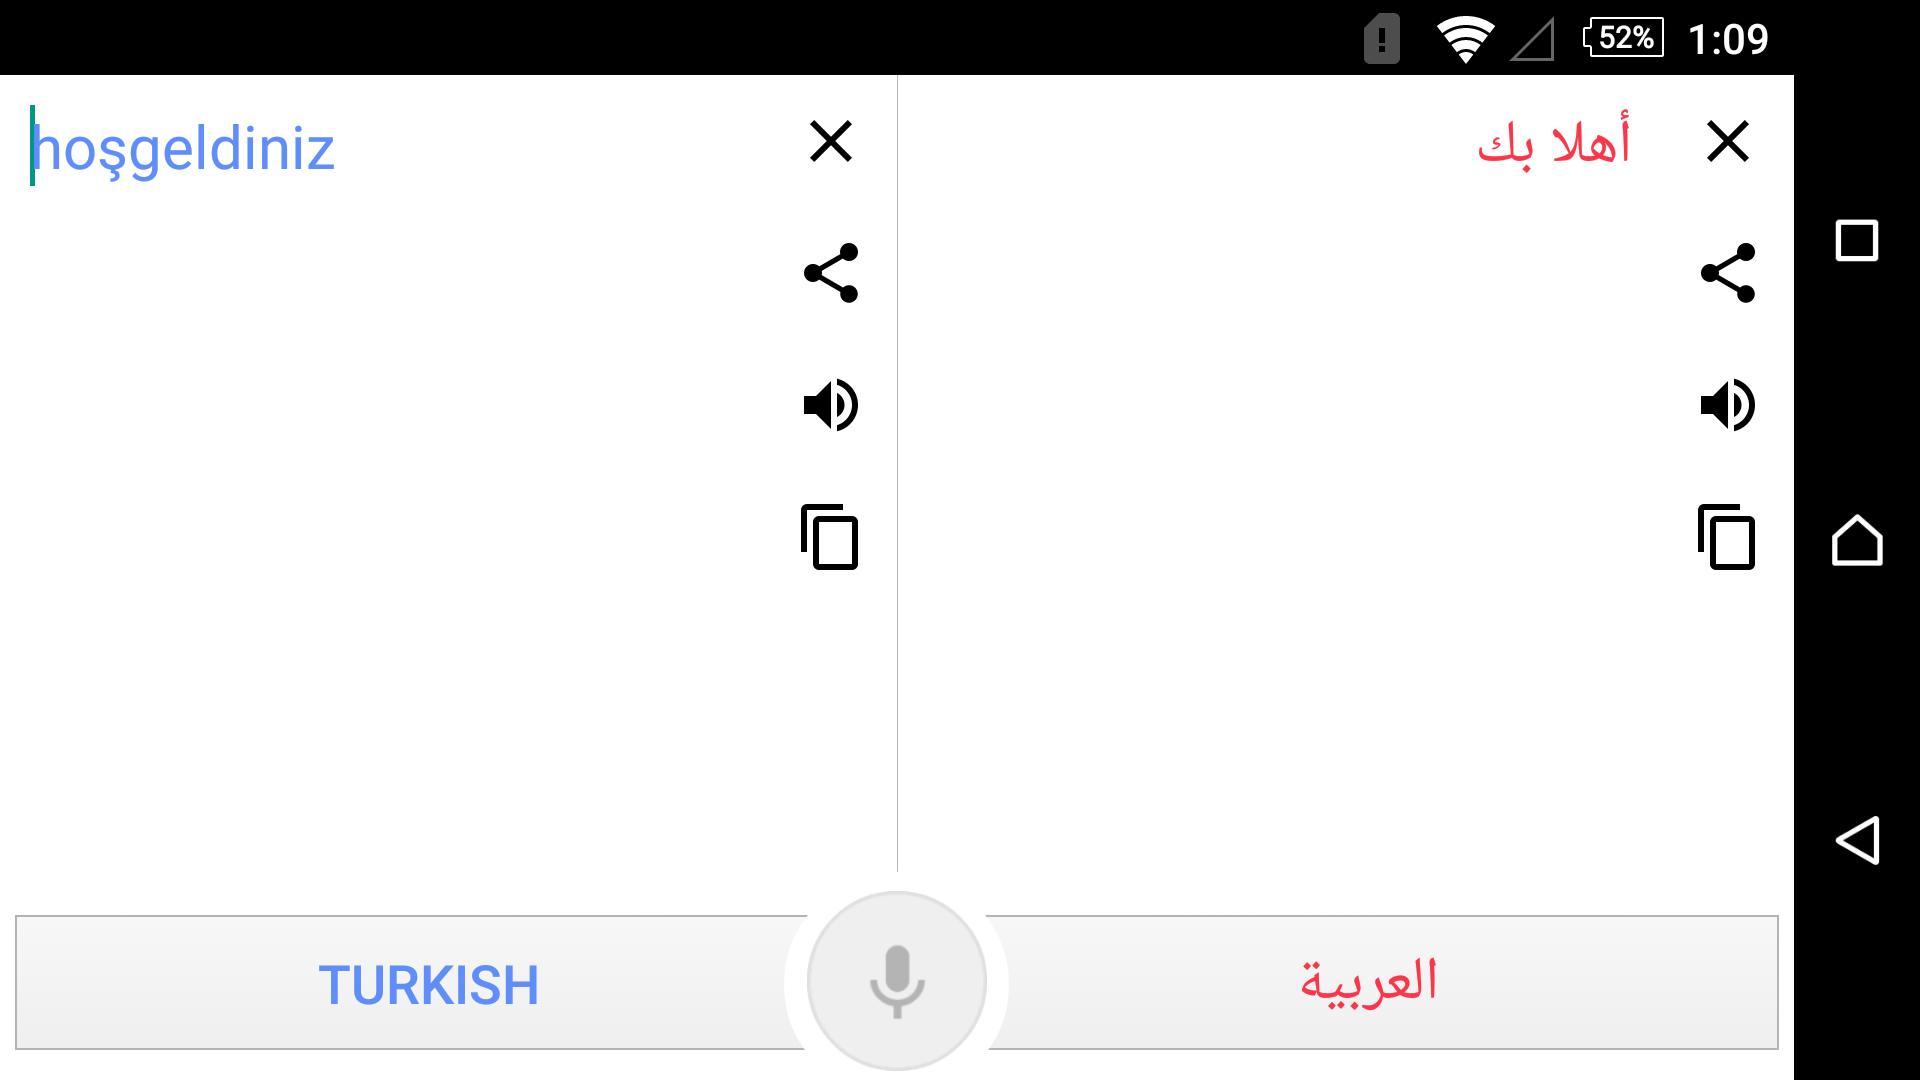 مترجم عربي تركي Fur Android Apk Herunterladen